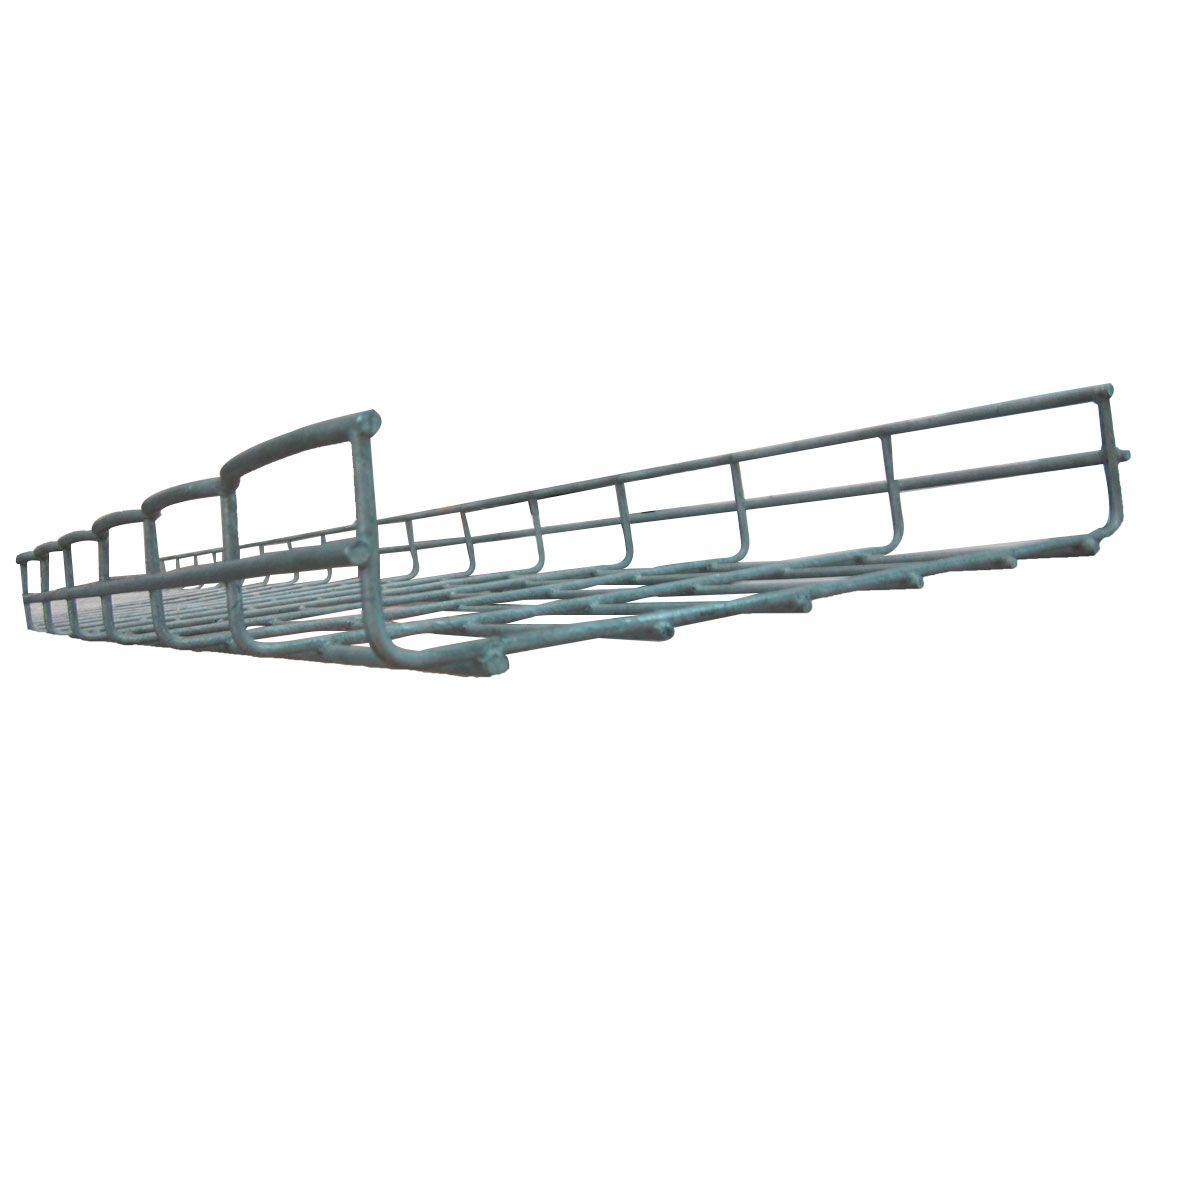 Bandeja porta cable tipo escalerilla galvanizada 0.30 m x 3 m BTE007